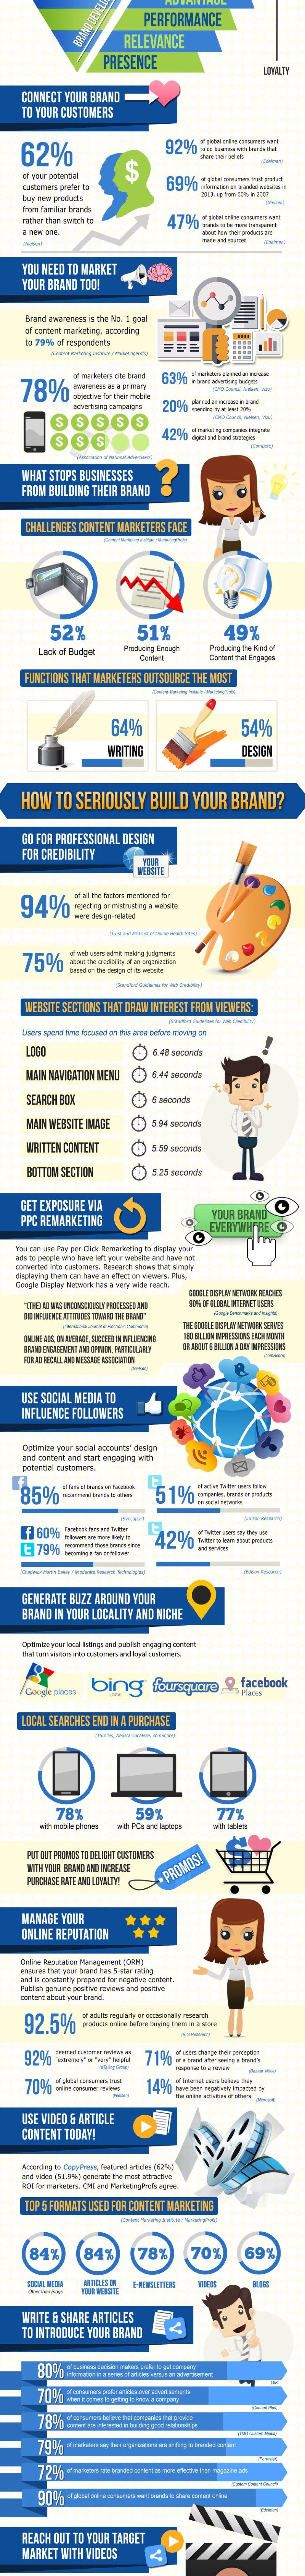 Brand-Optimization-Infographic